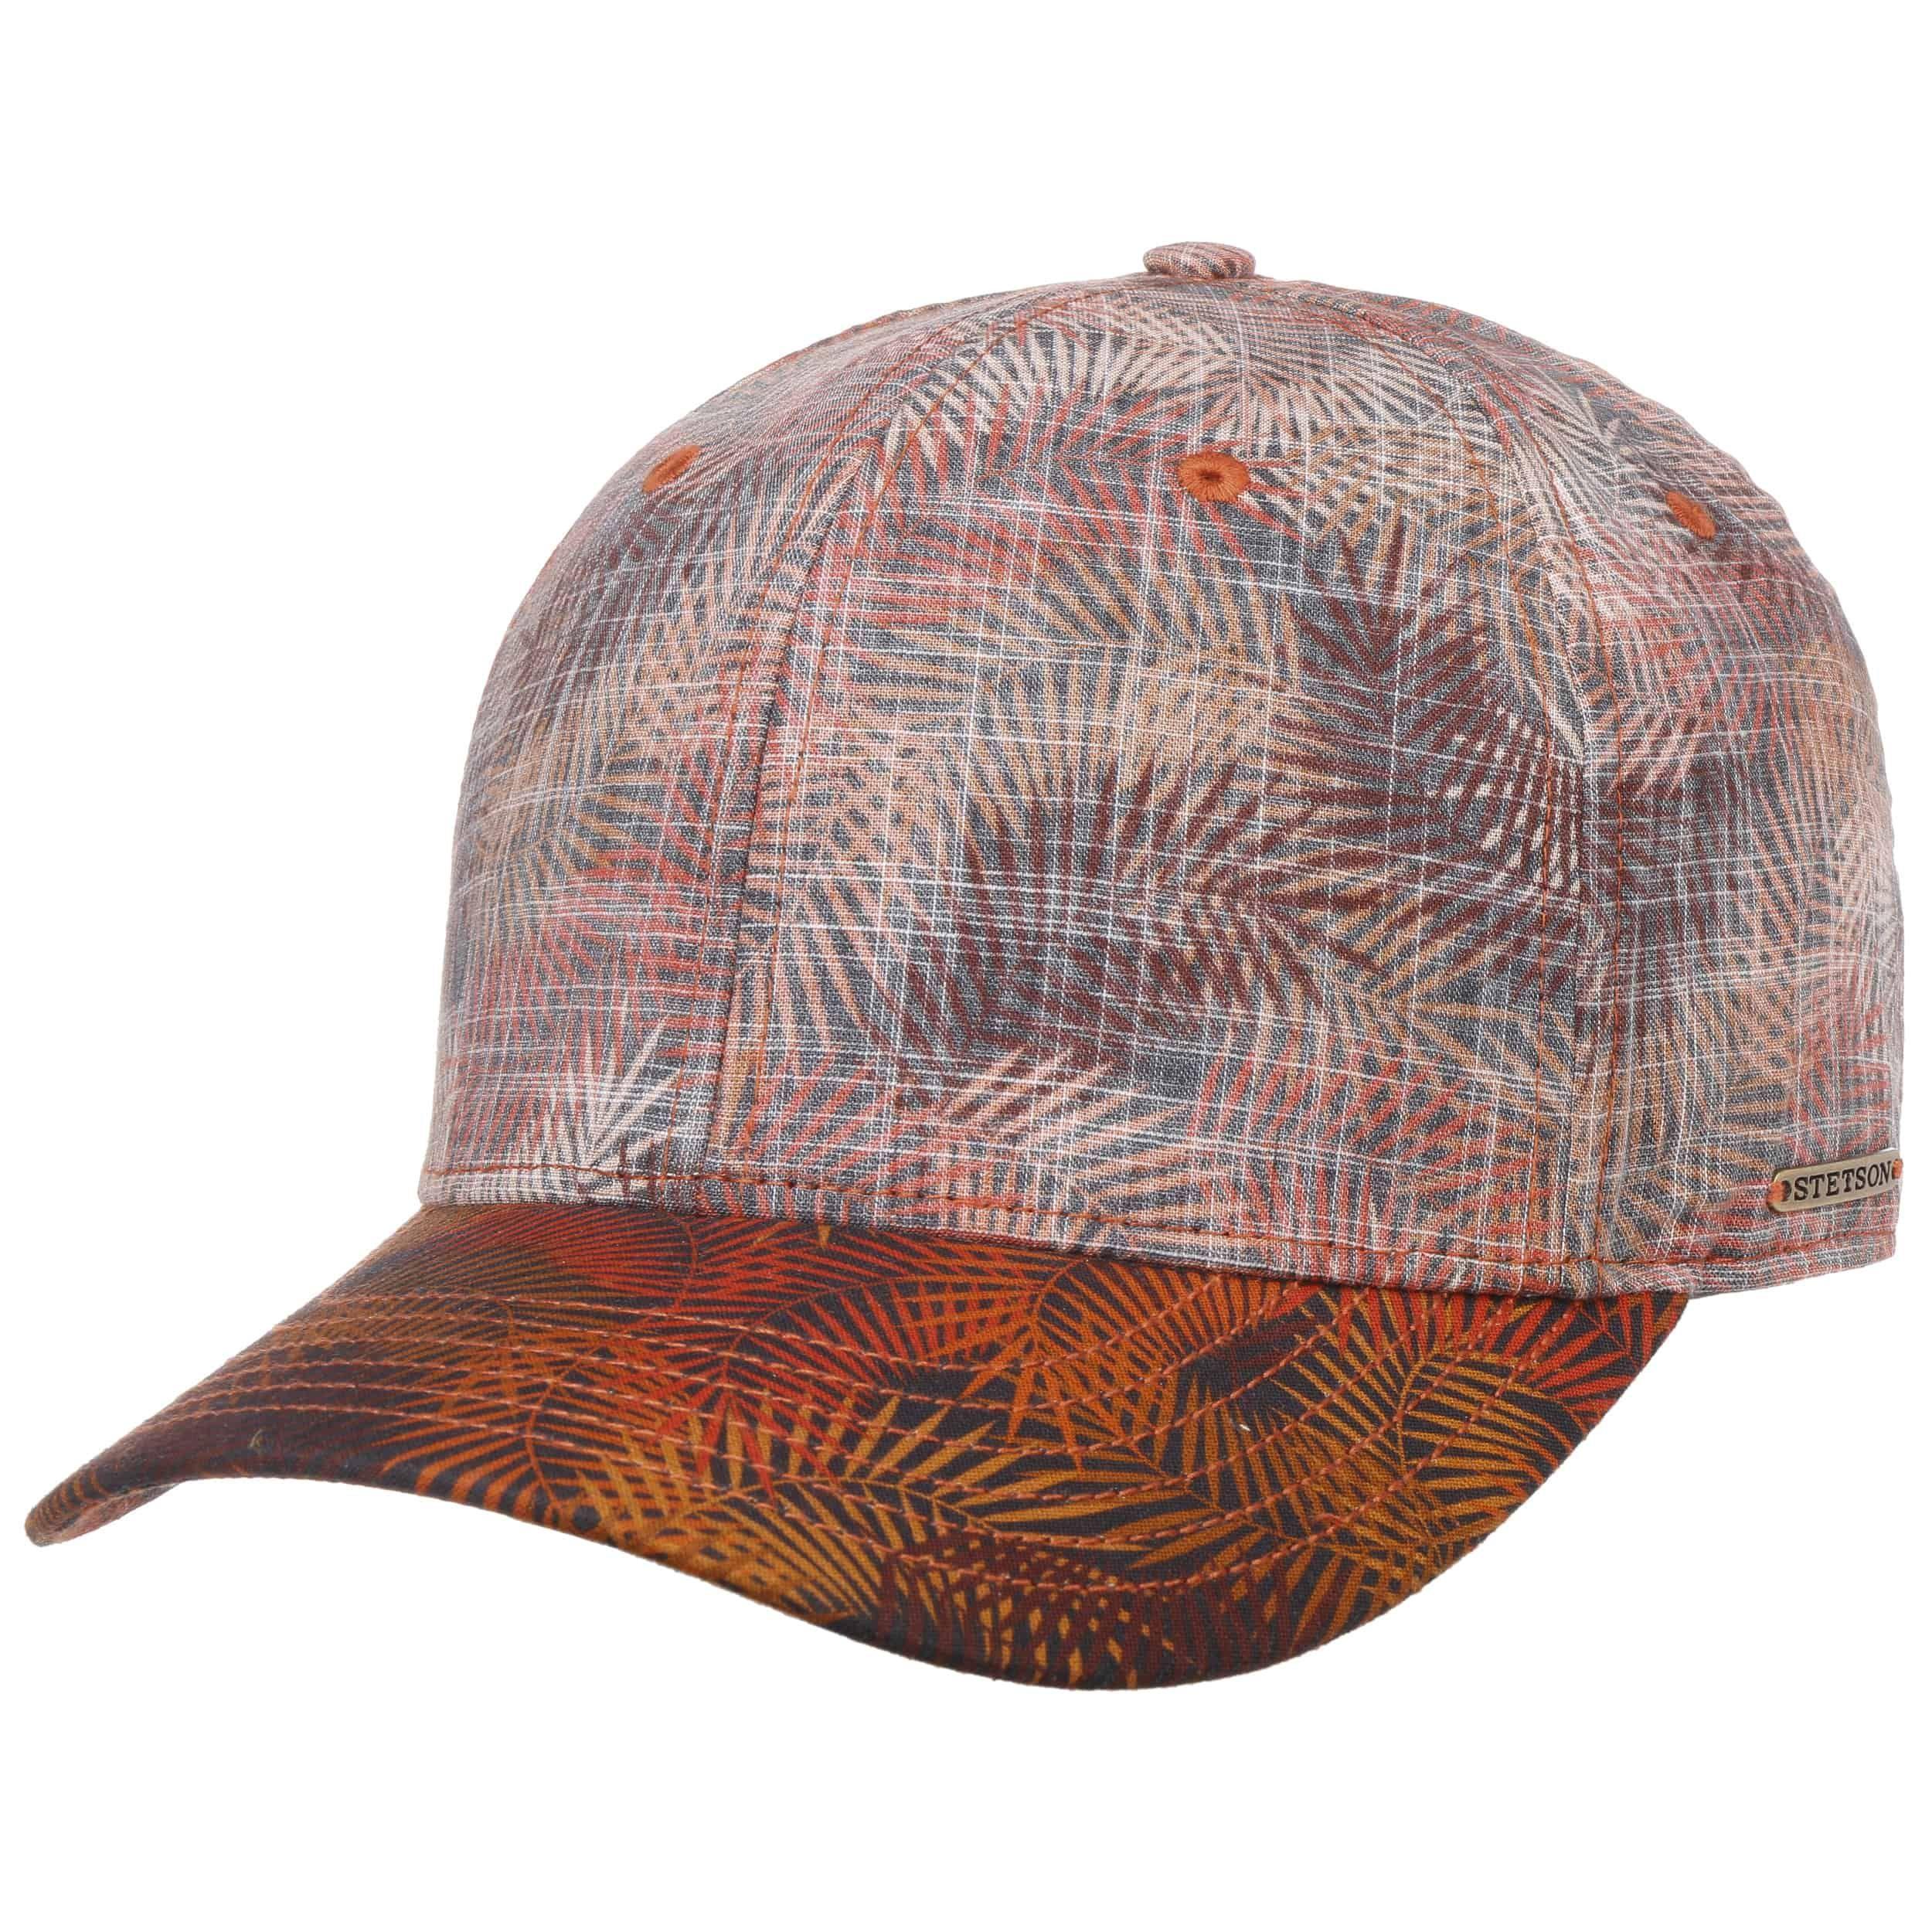 Palm Leaf Baseballcap orange-meliert